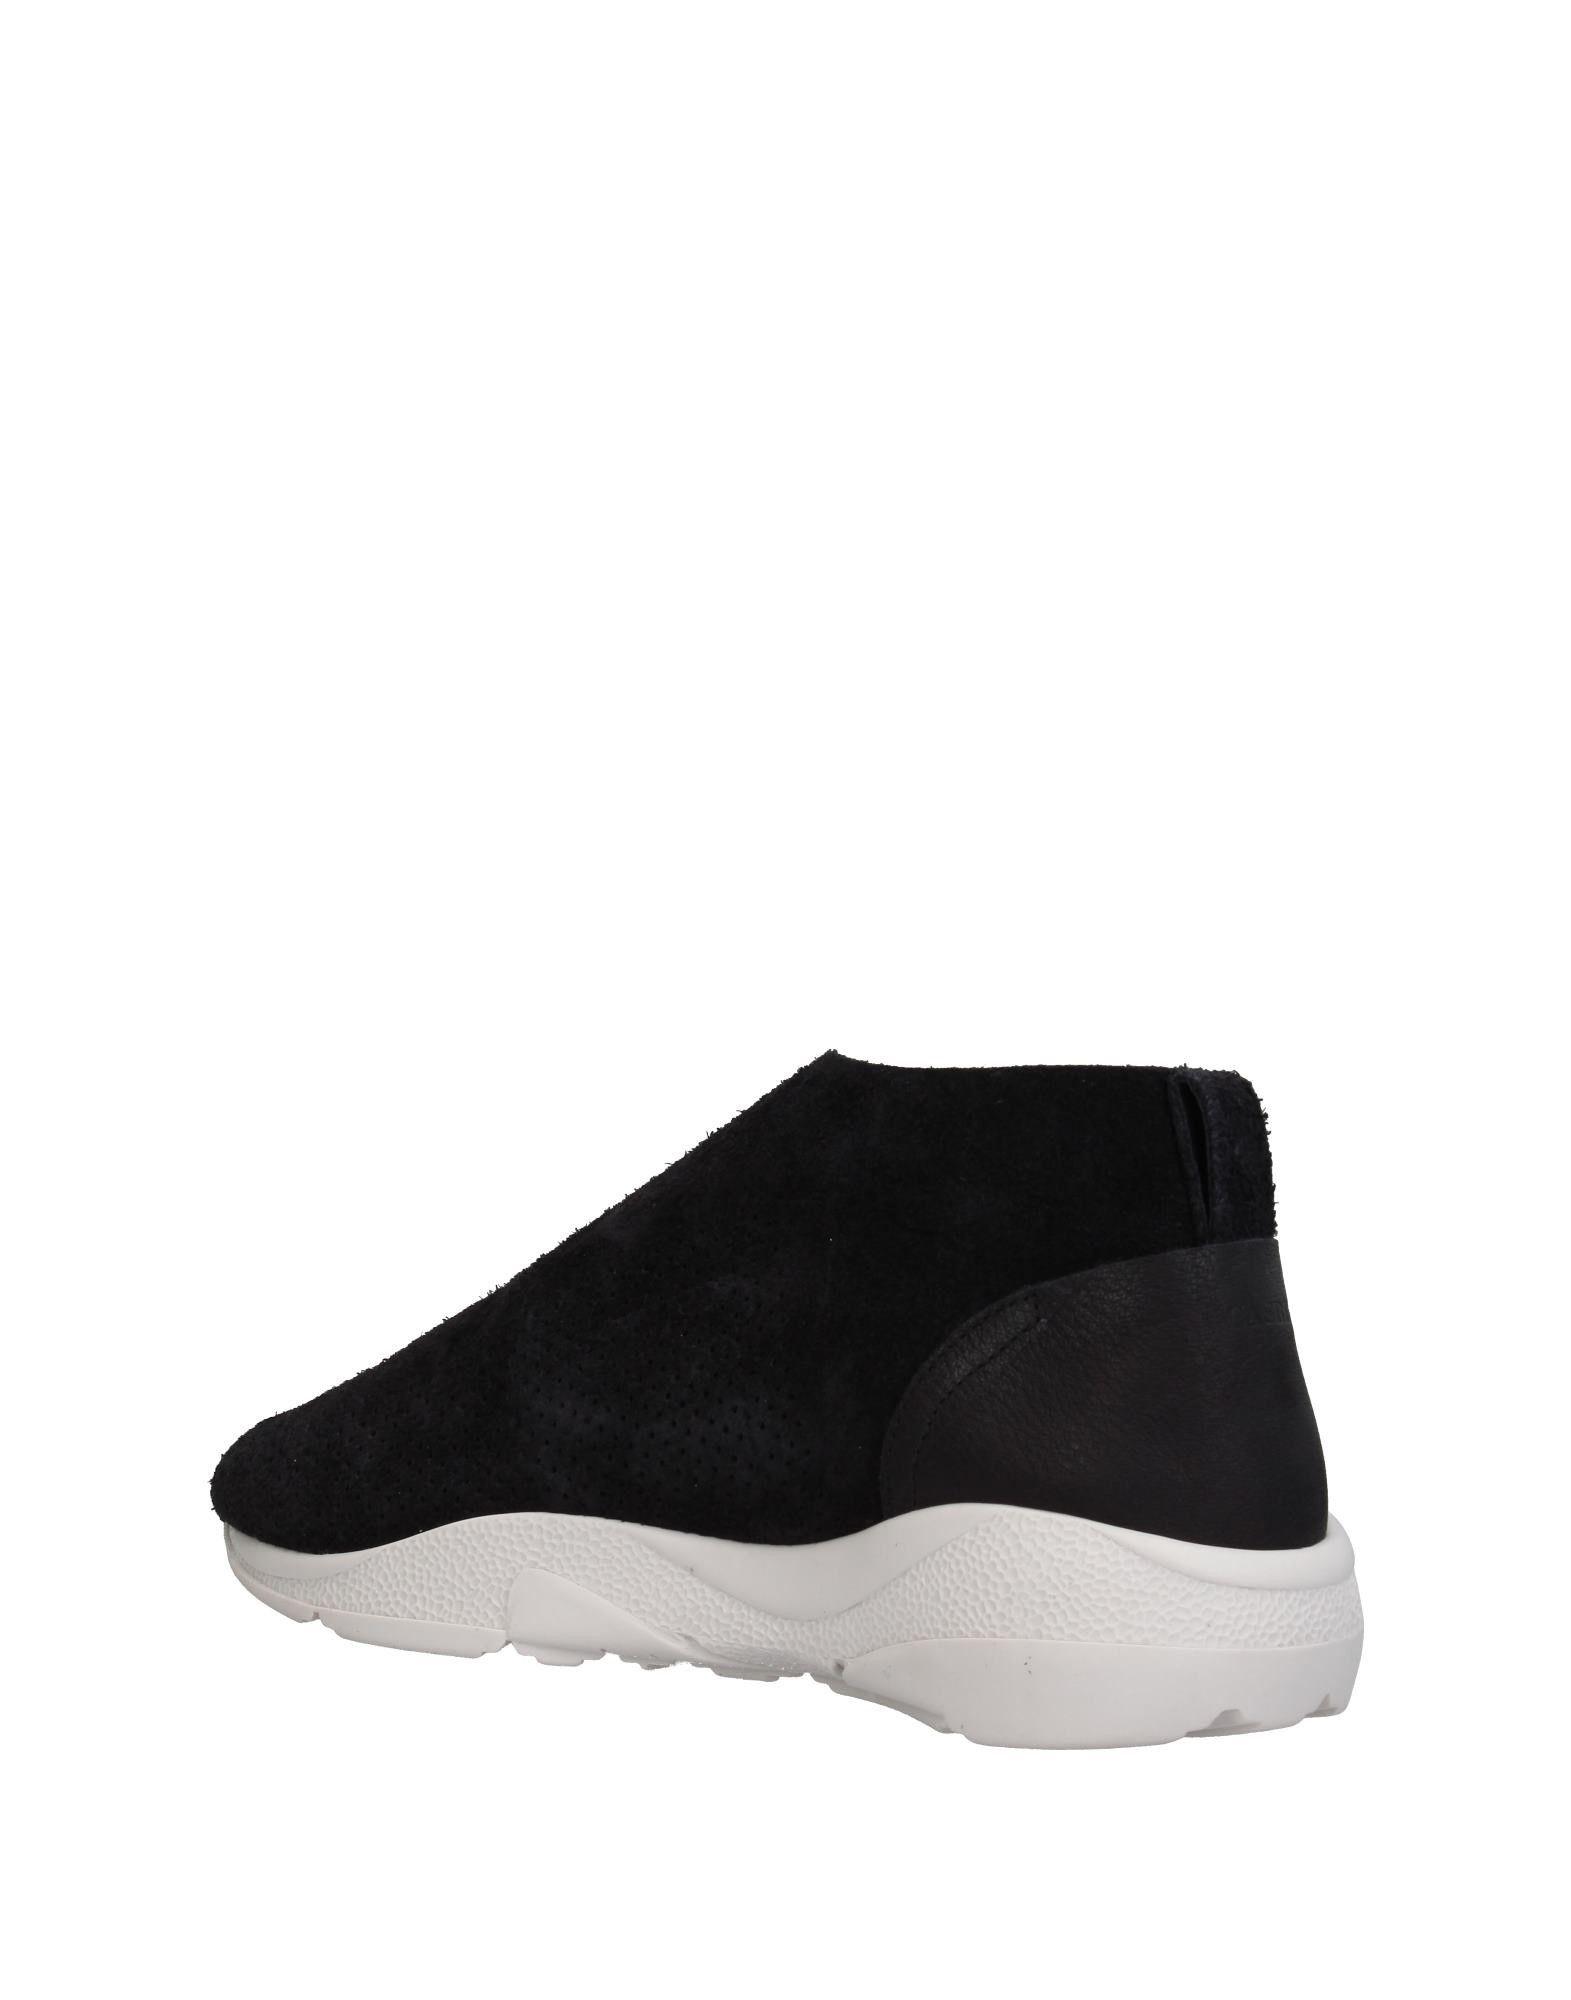 11387164BD Casbia Sneakers Herren  11387164BD  Heiße Schuhe 84fa7c